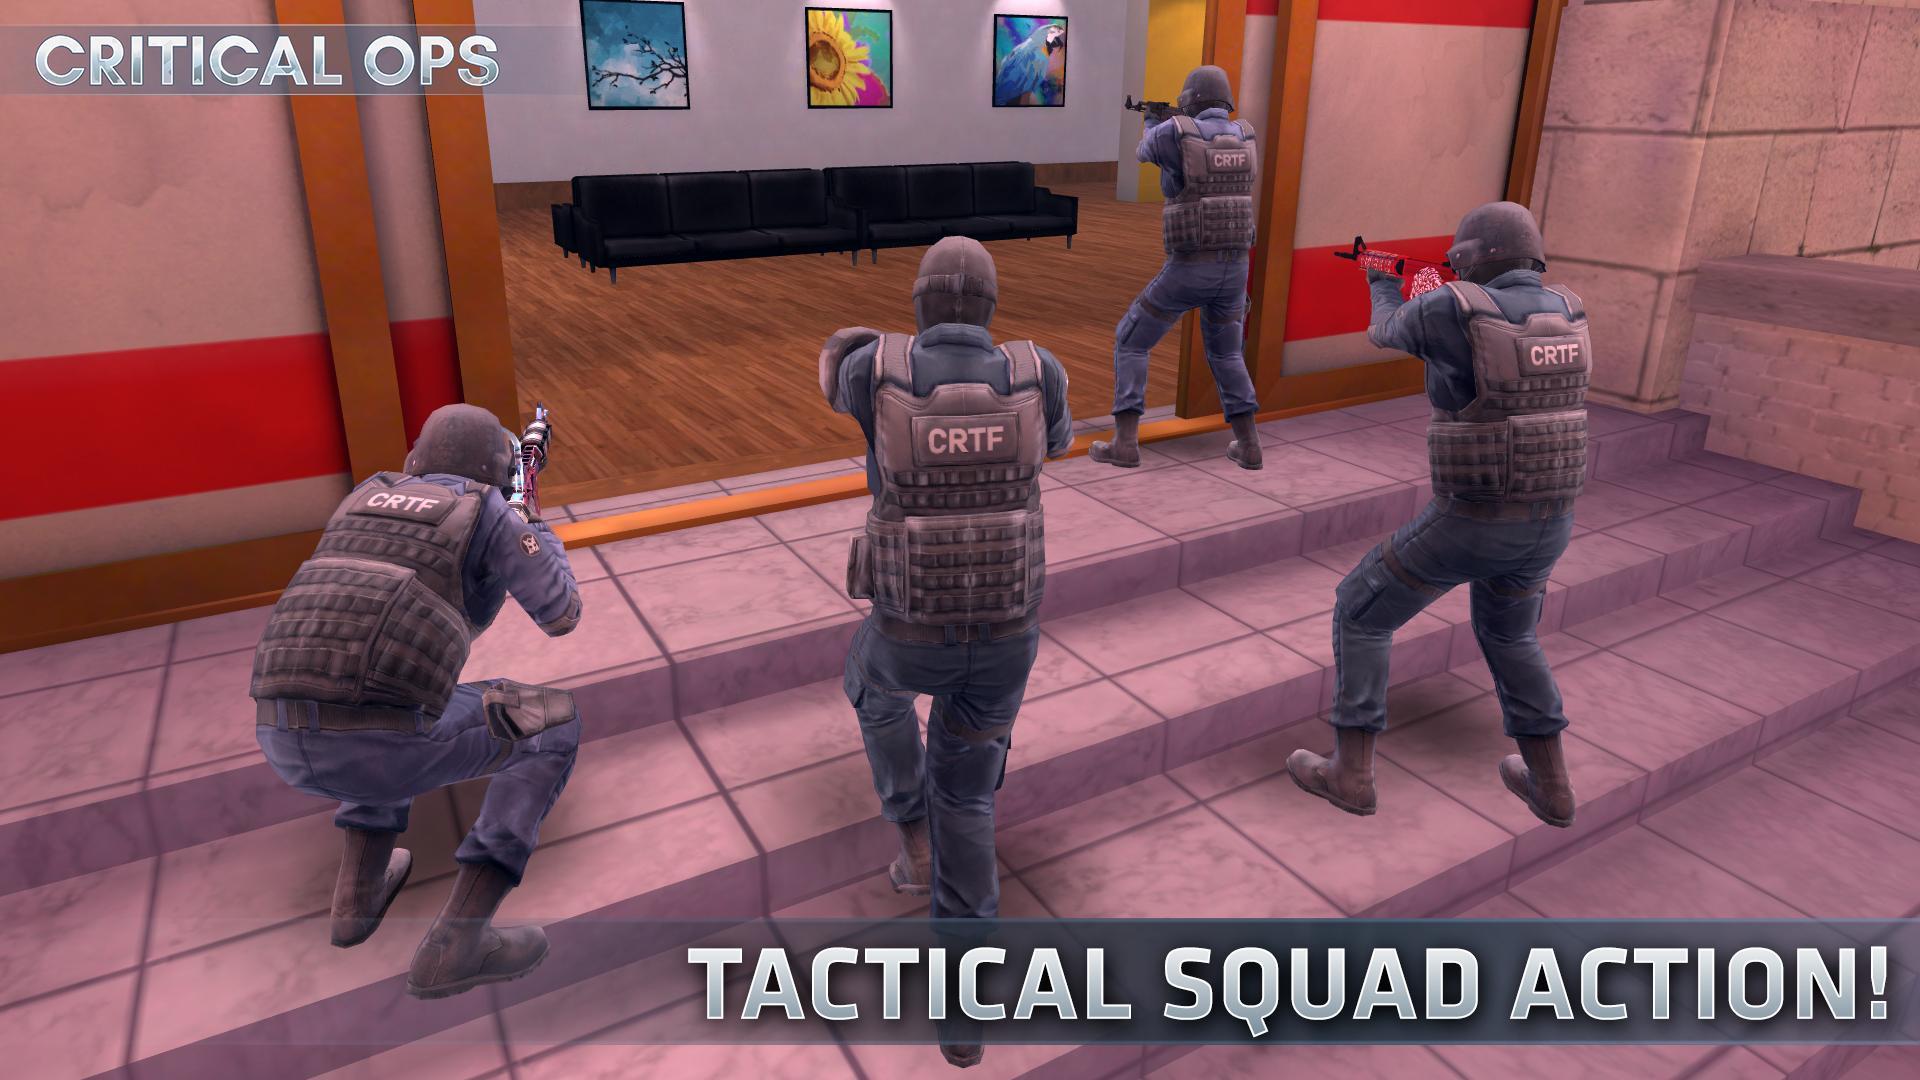 Critical Ops Multiplayer FPS 1.21.0.f1253 Screenshot 7